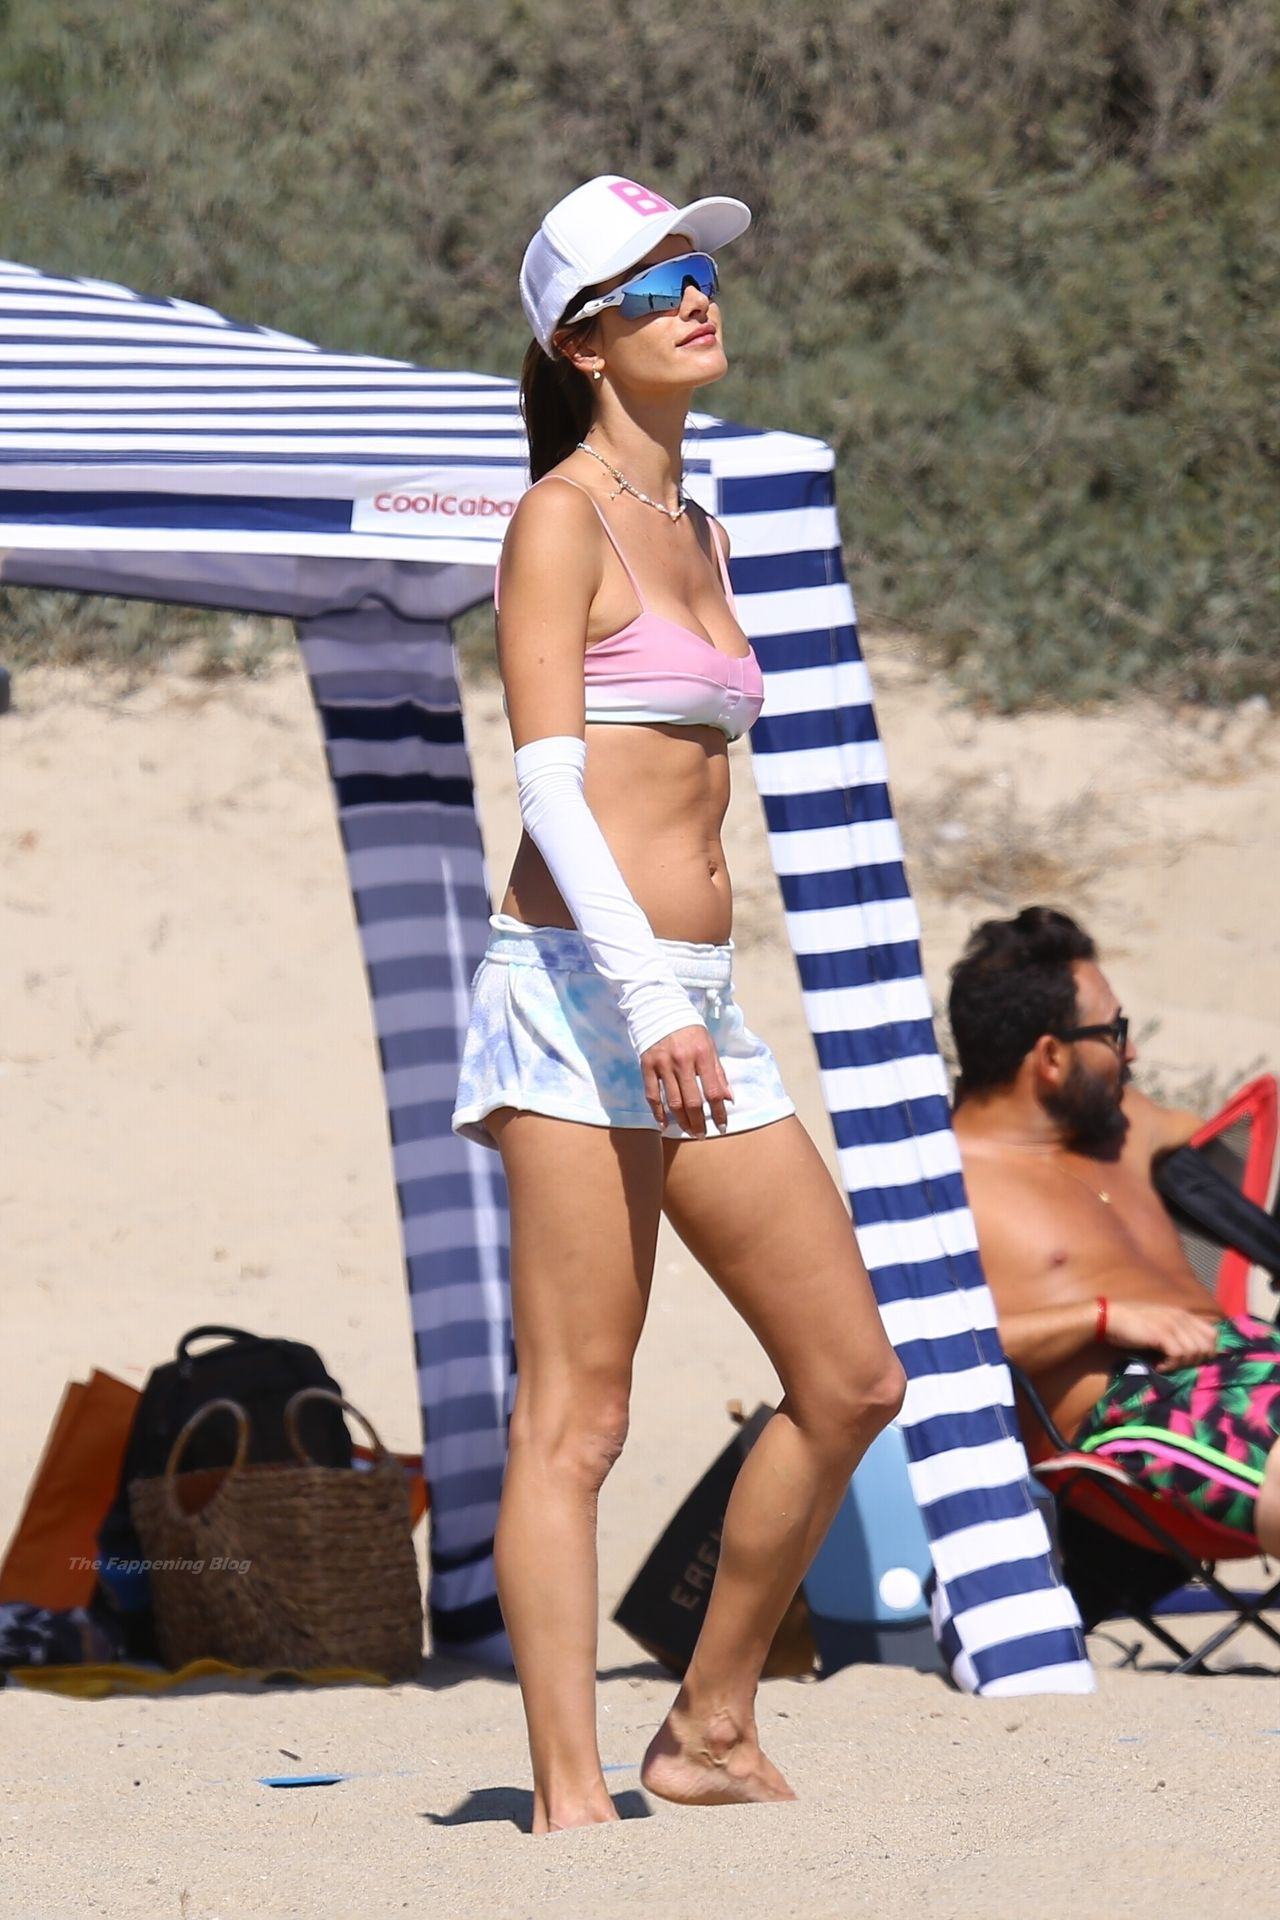 Alessandra-Ambrosio-Sexy-The-Fappening-Blog-27-1.jpg